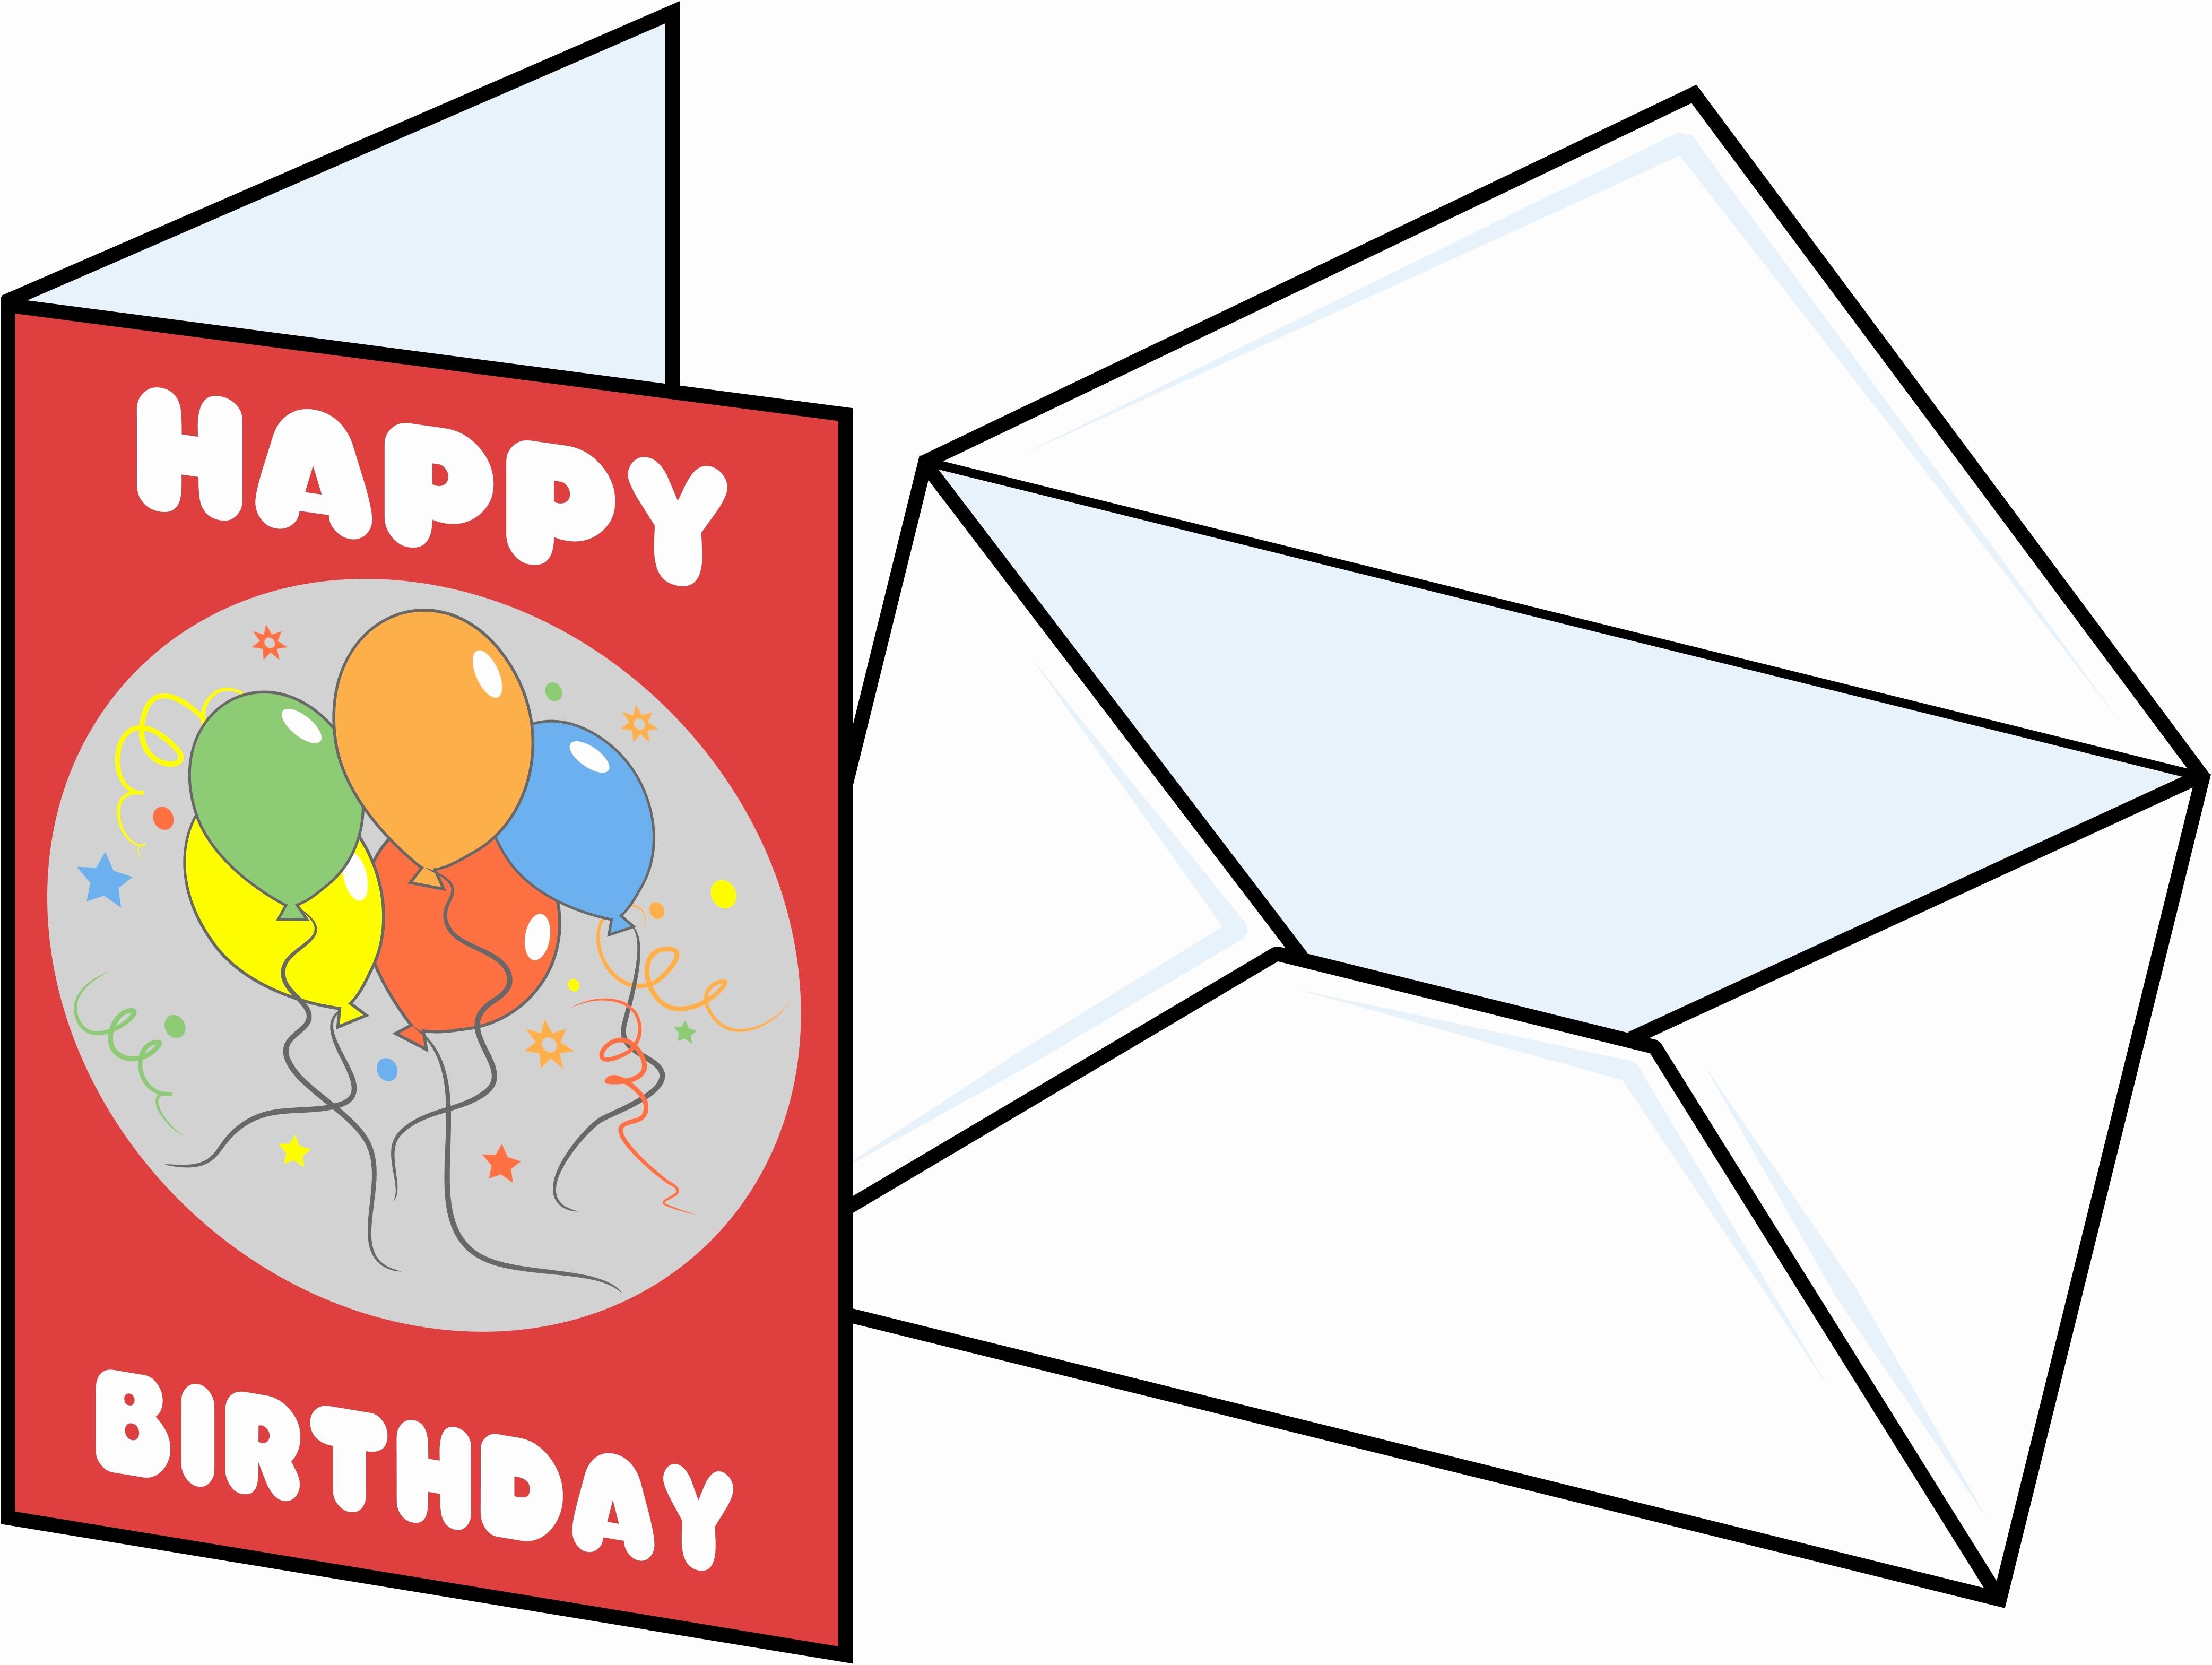 4169x3138 Birthday Card Clipart Inspirational Birthday Cards Clip Art 82 72